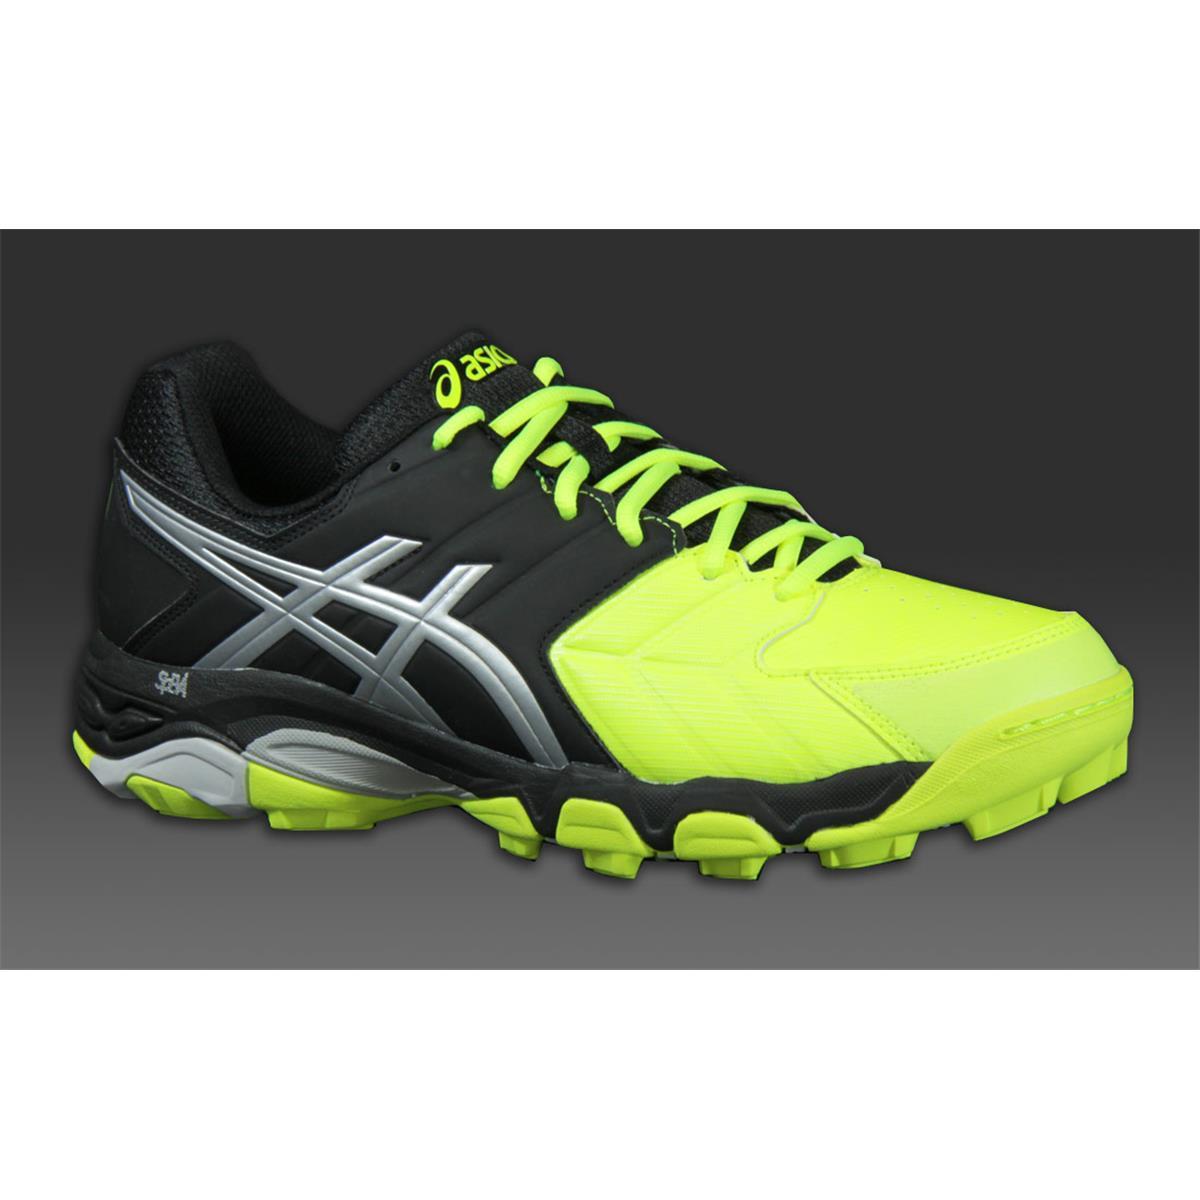 asics gel blackheath 6 mens hockey shoes yellow silver